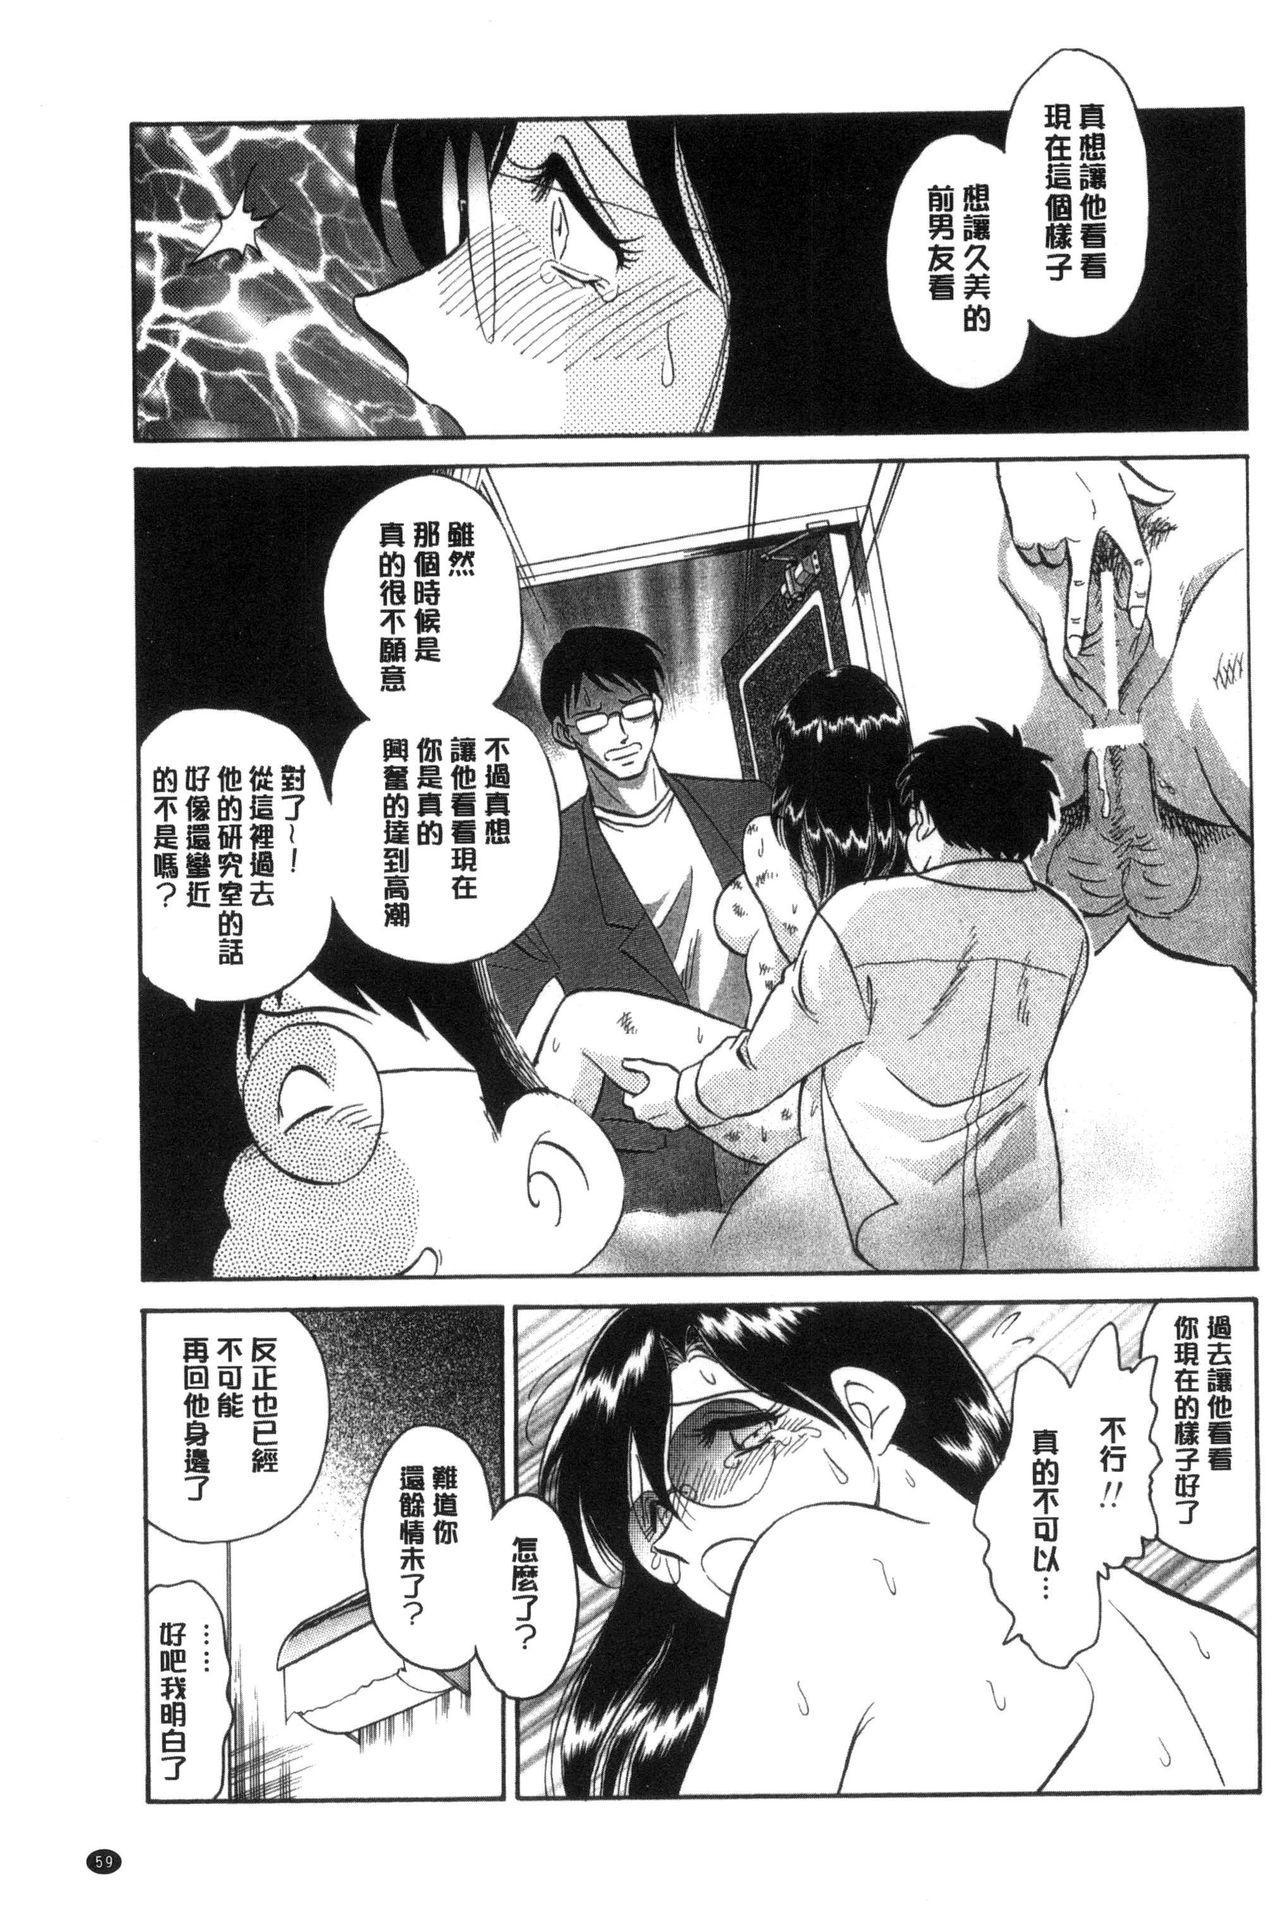 Hazukashii Kagai Jugyou | 害羞的課外授業 59